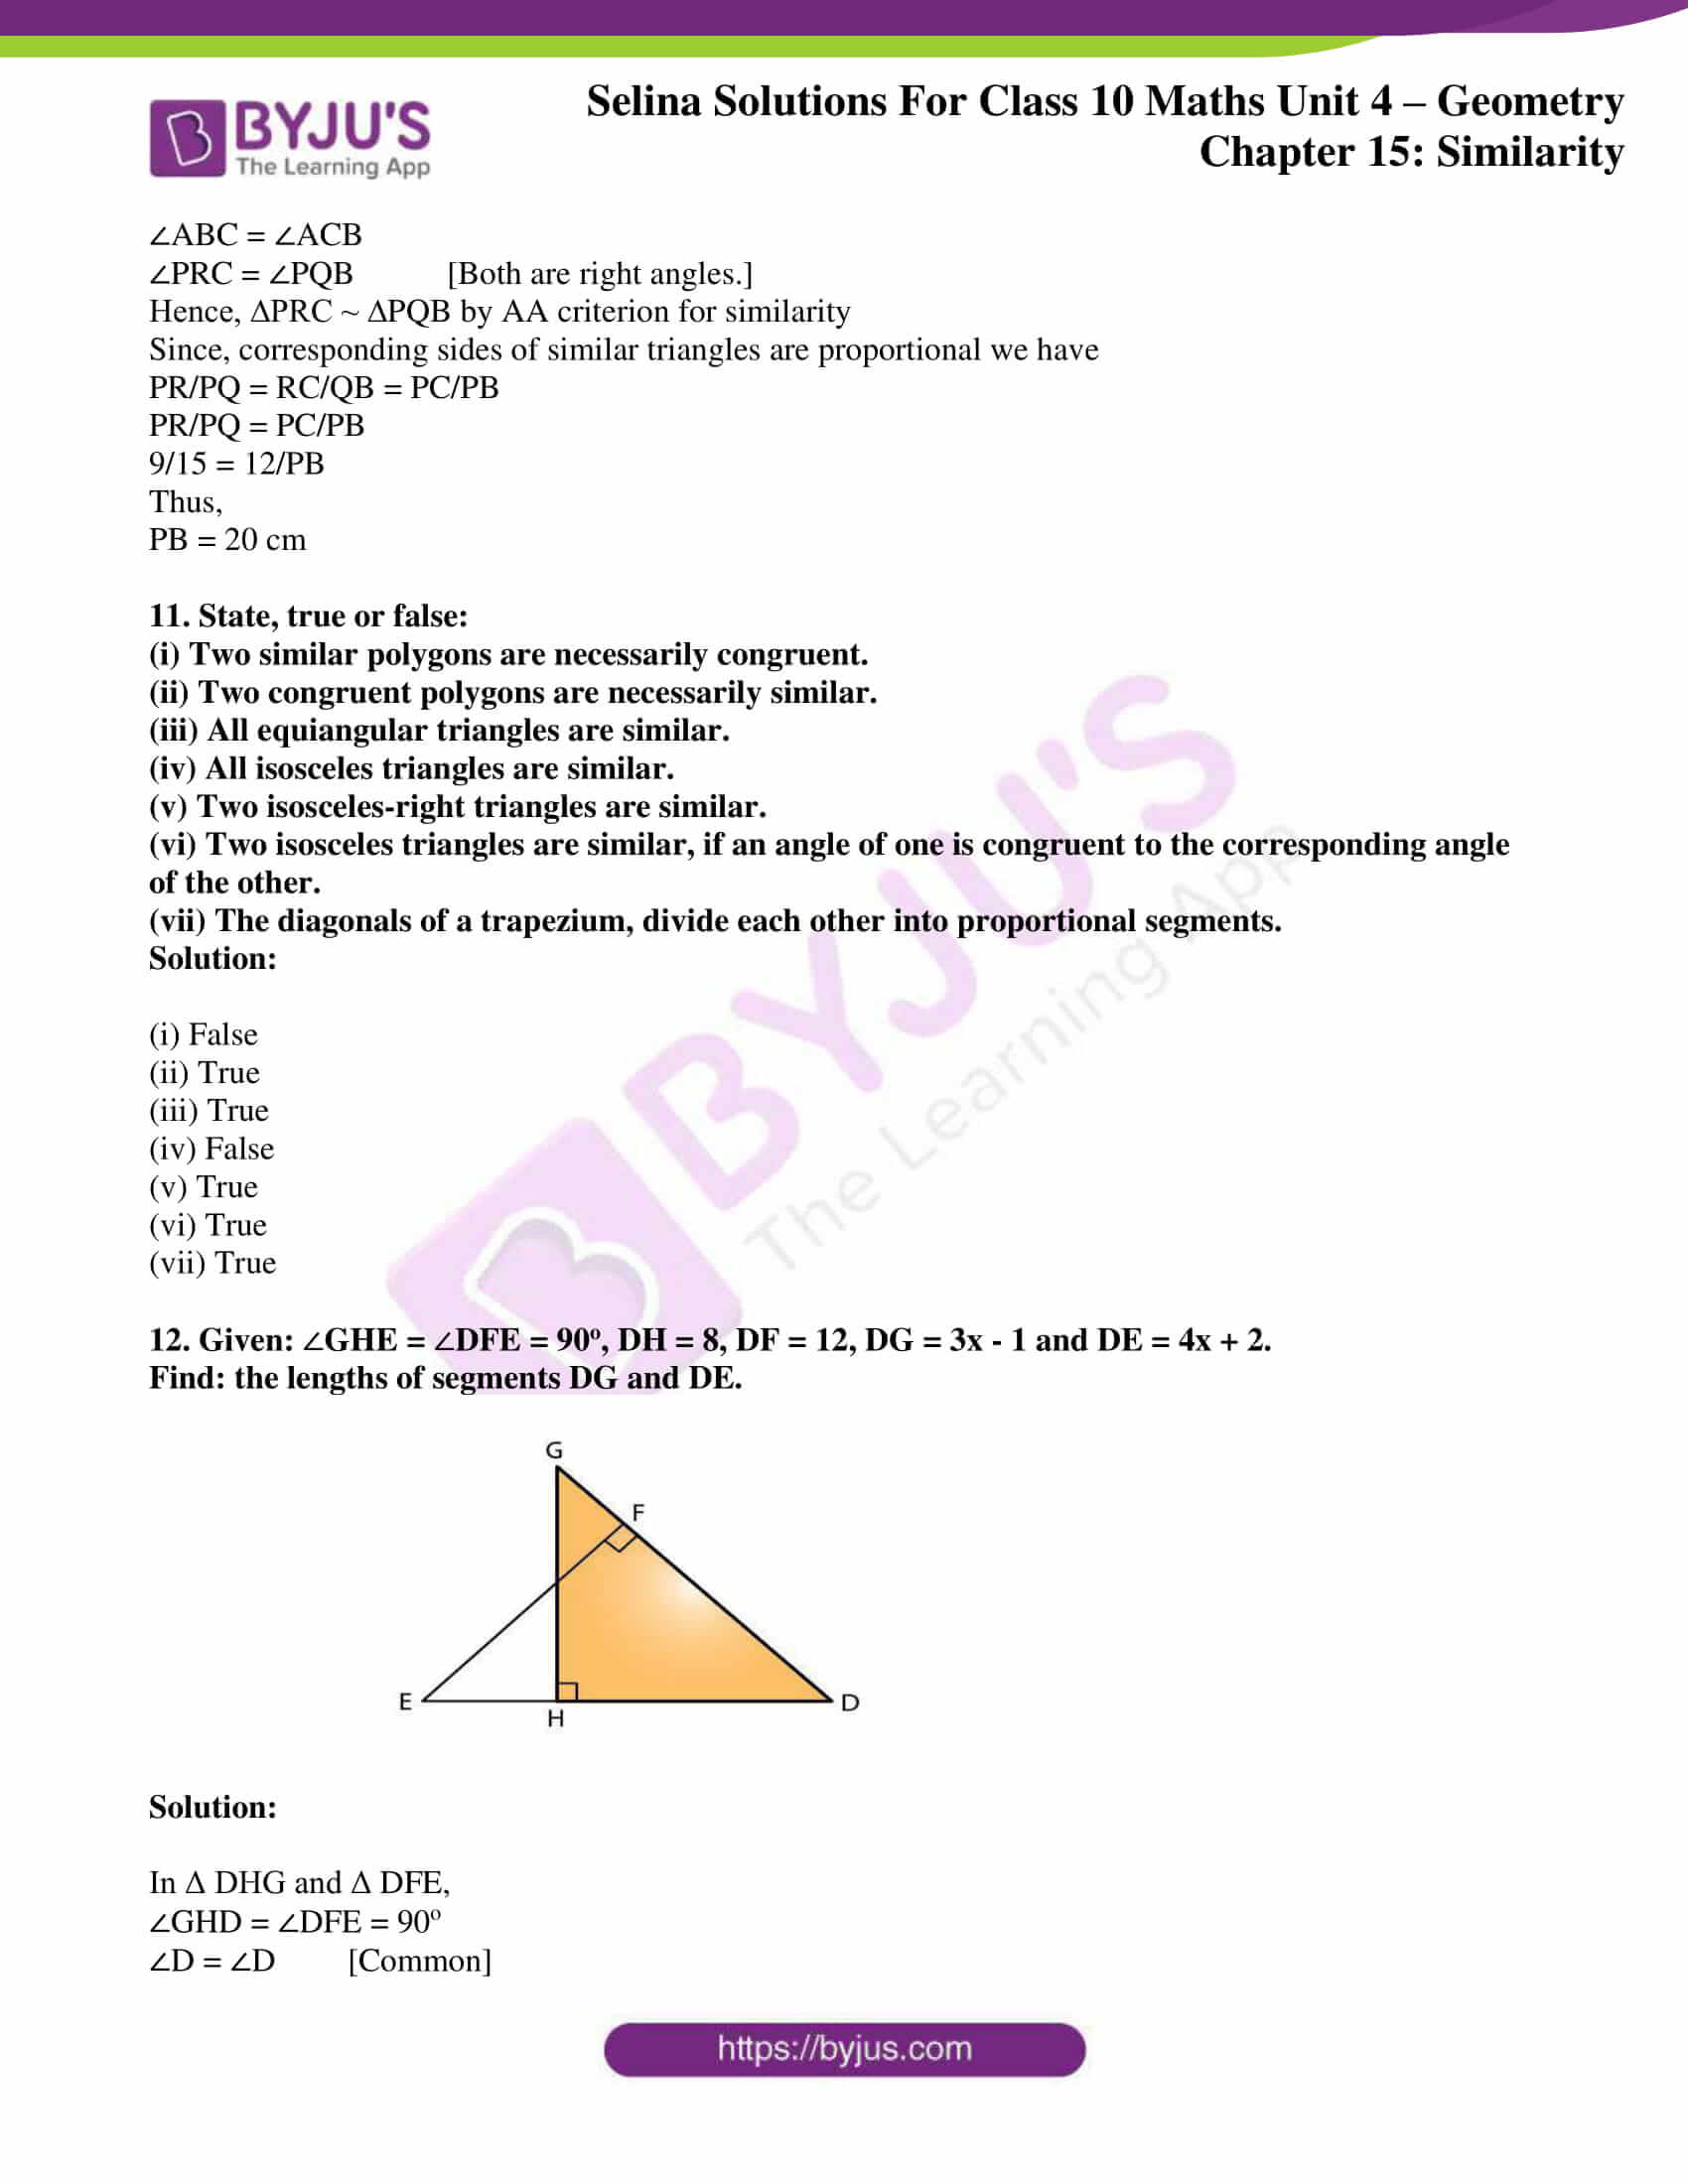 selina-sol-maths-class-10-ch-15-ex-a-7